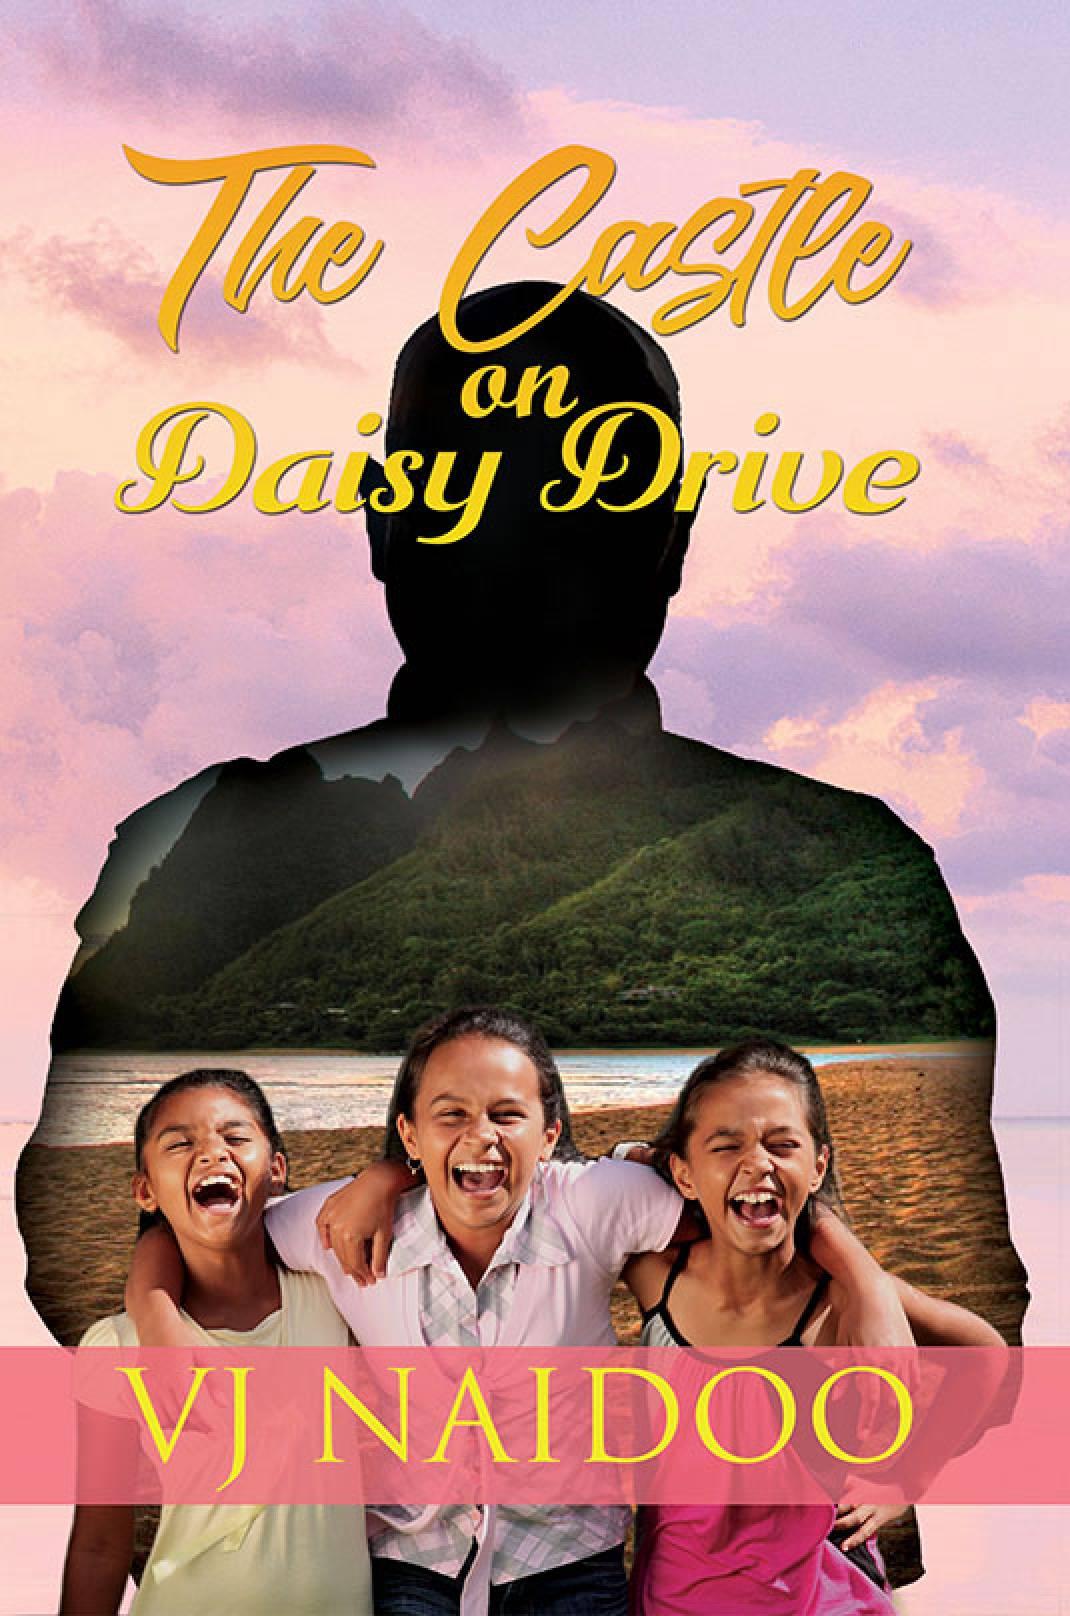 The castle on Daisy drive